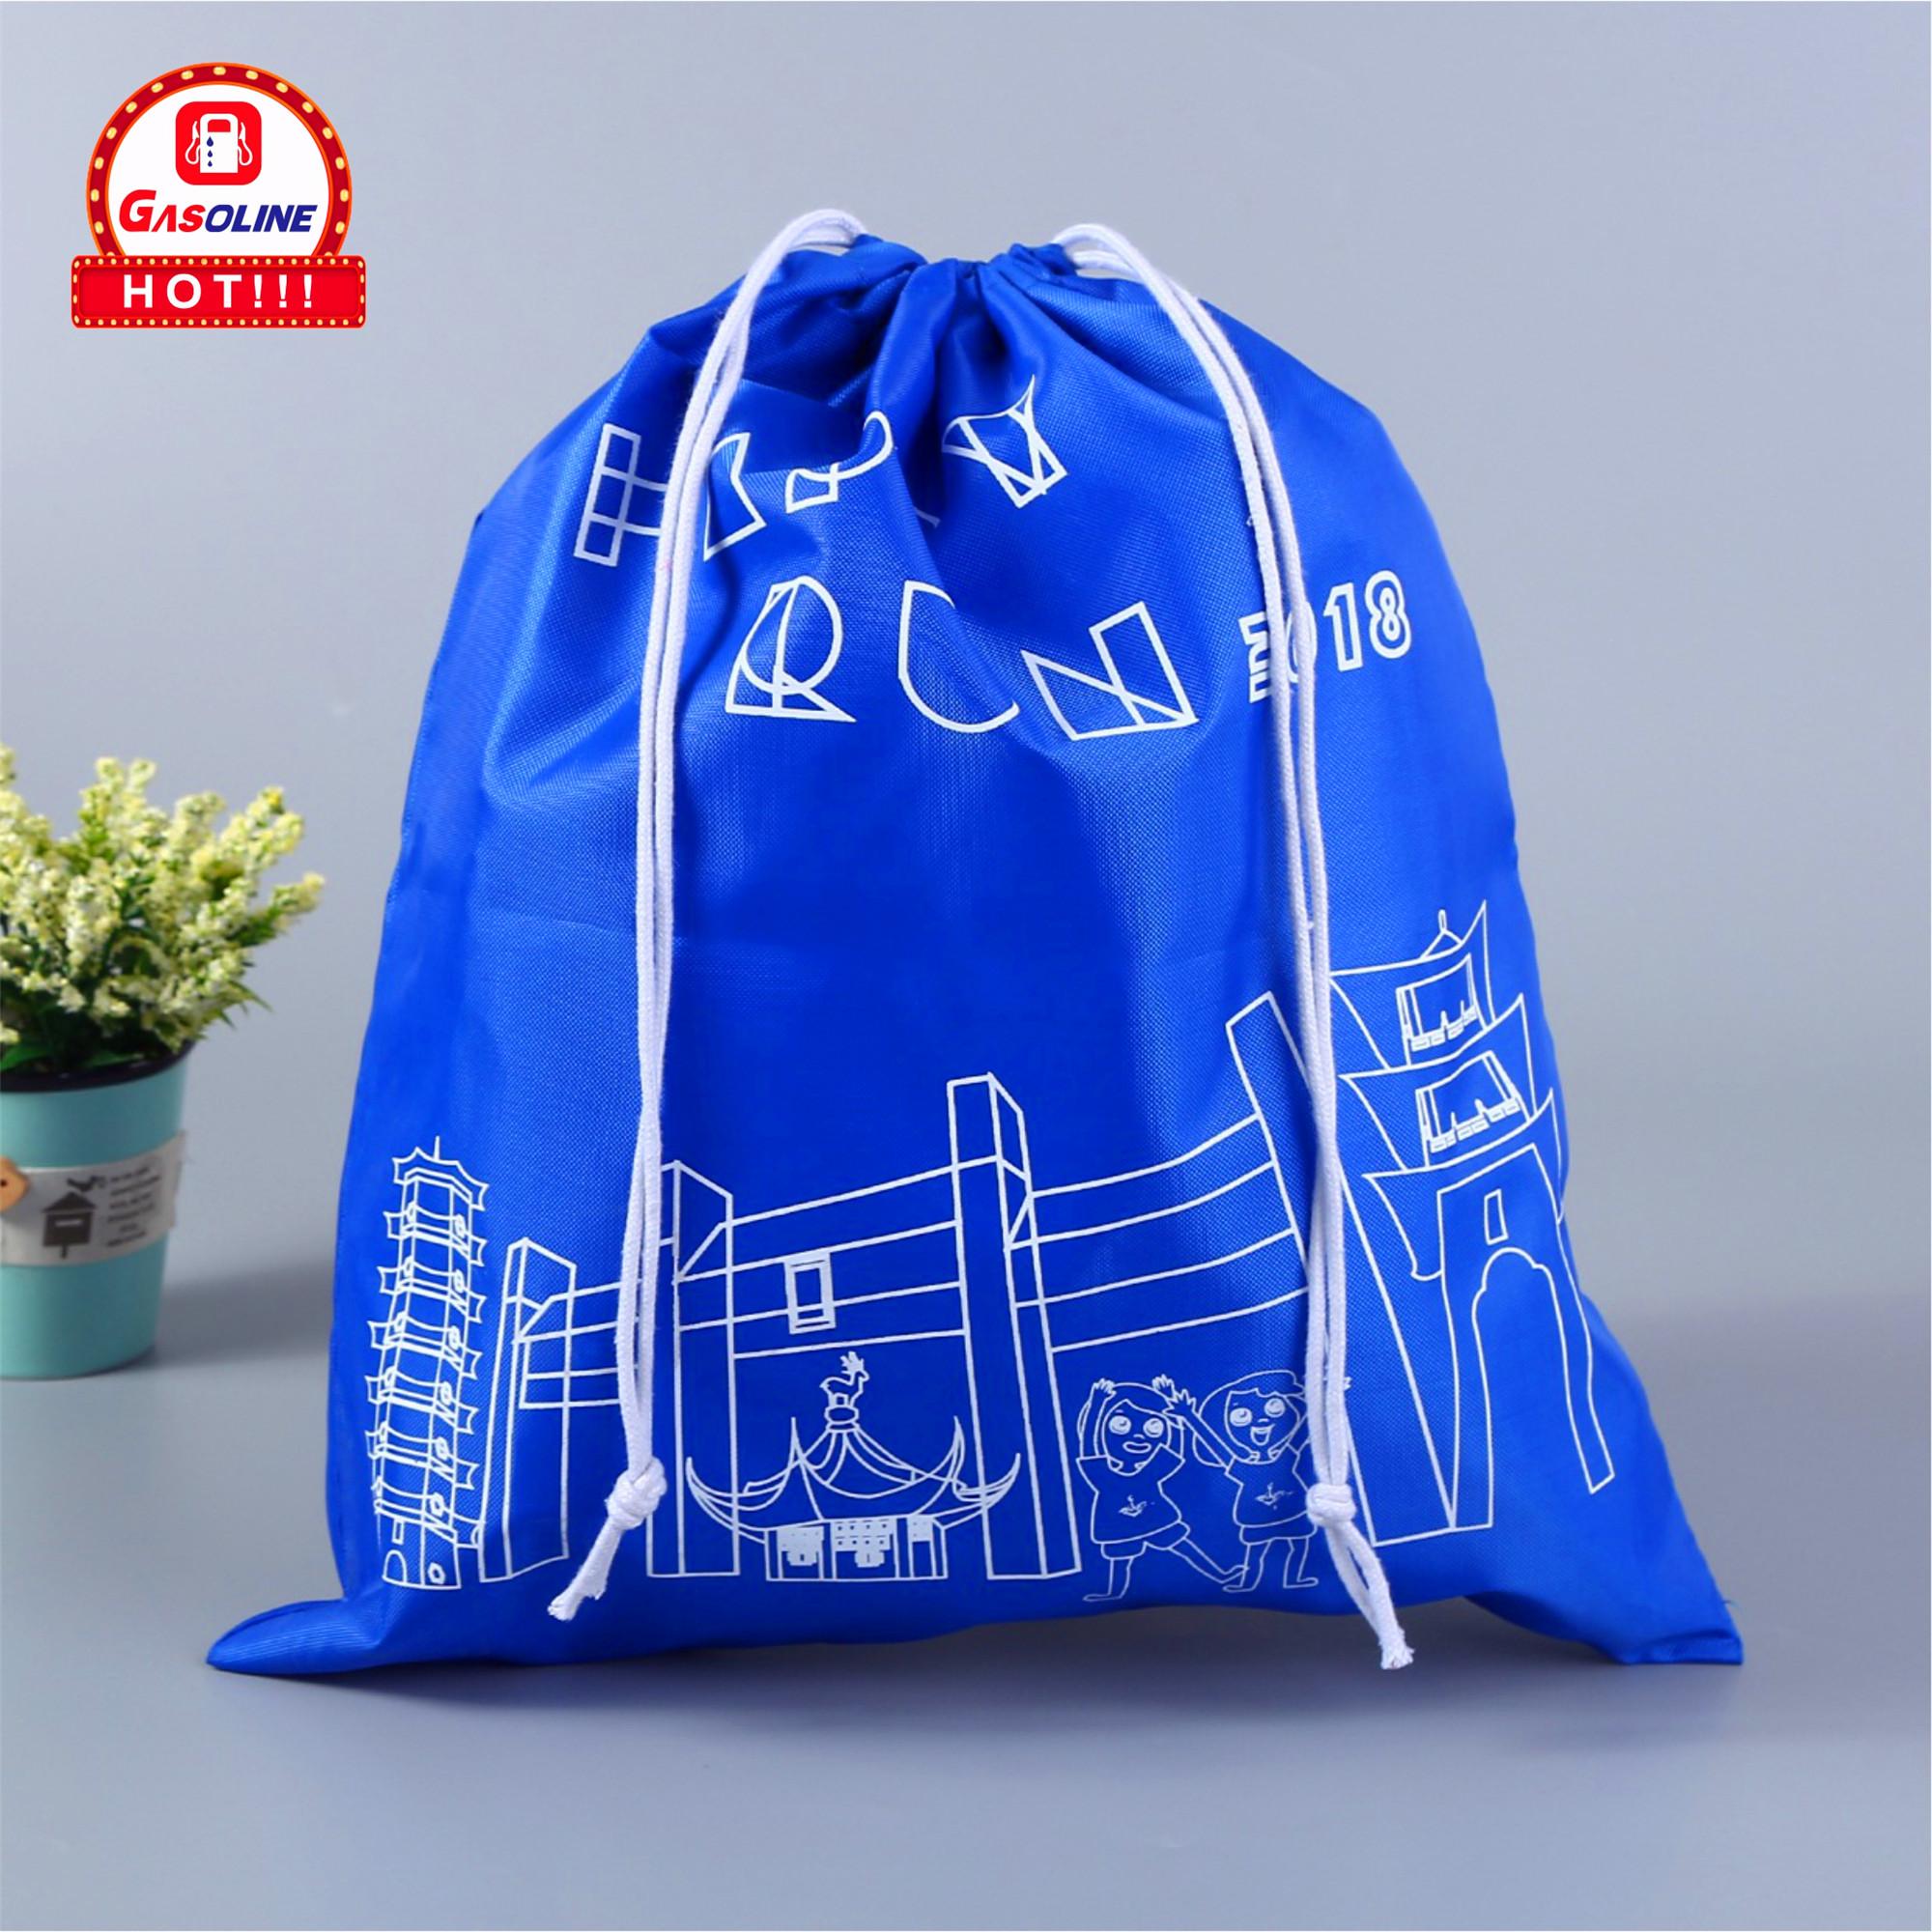 OEM पर्यावरण के अनुकूल छोटे मुद्रित रीसायकल पॉलिएस्टर क्रिसमस Drawstring उपहार बैग